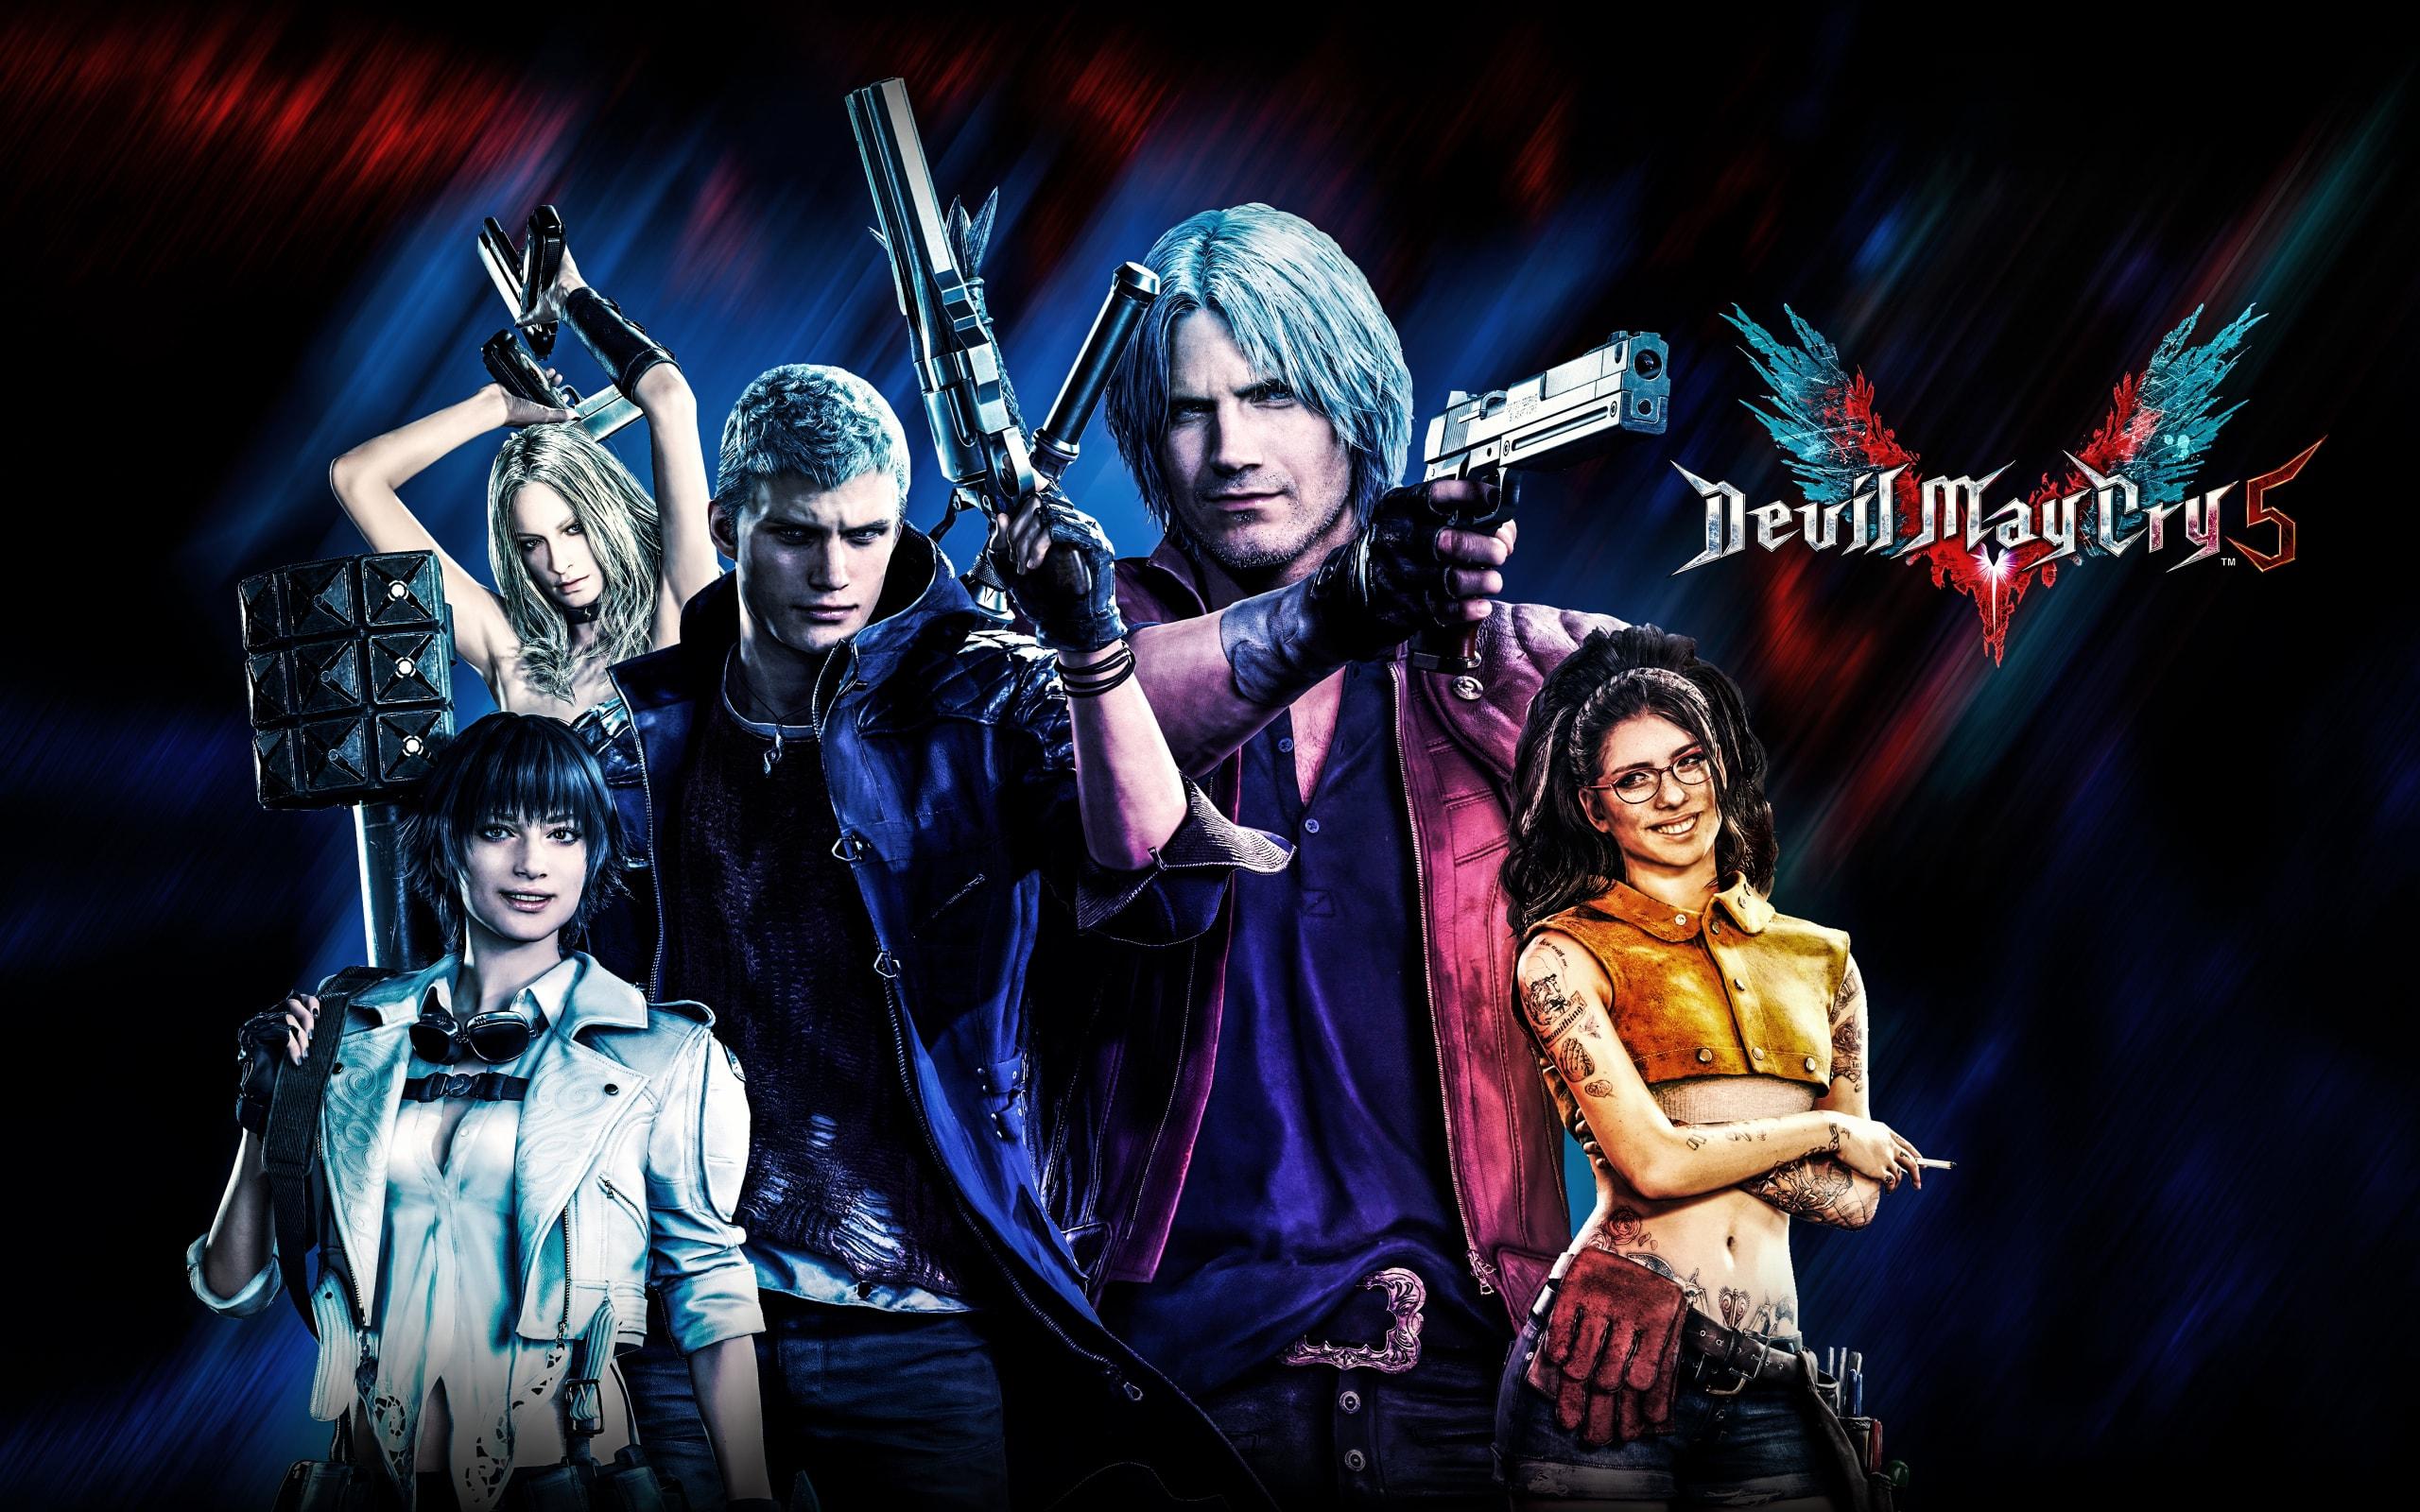 Wallpaper Of Devil May Cry 5 Dante Lady Nero Nico Devil May